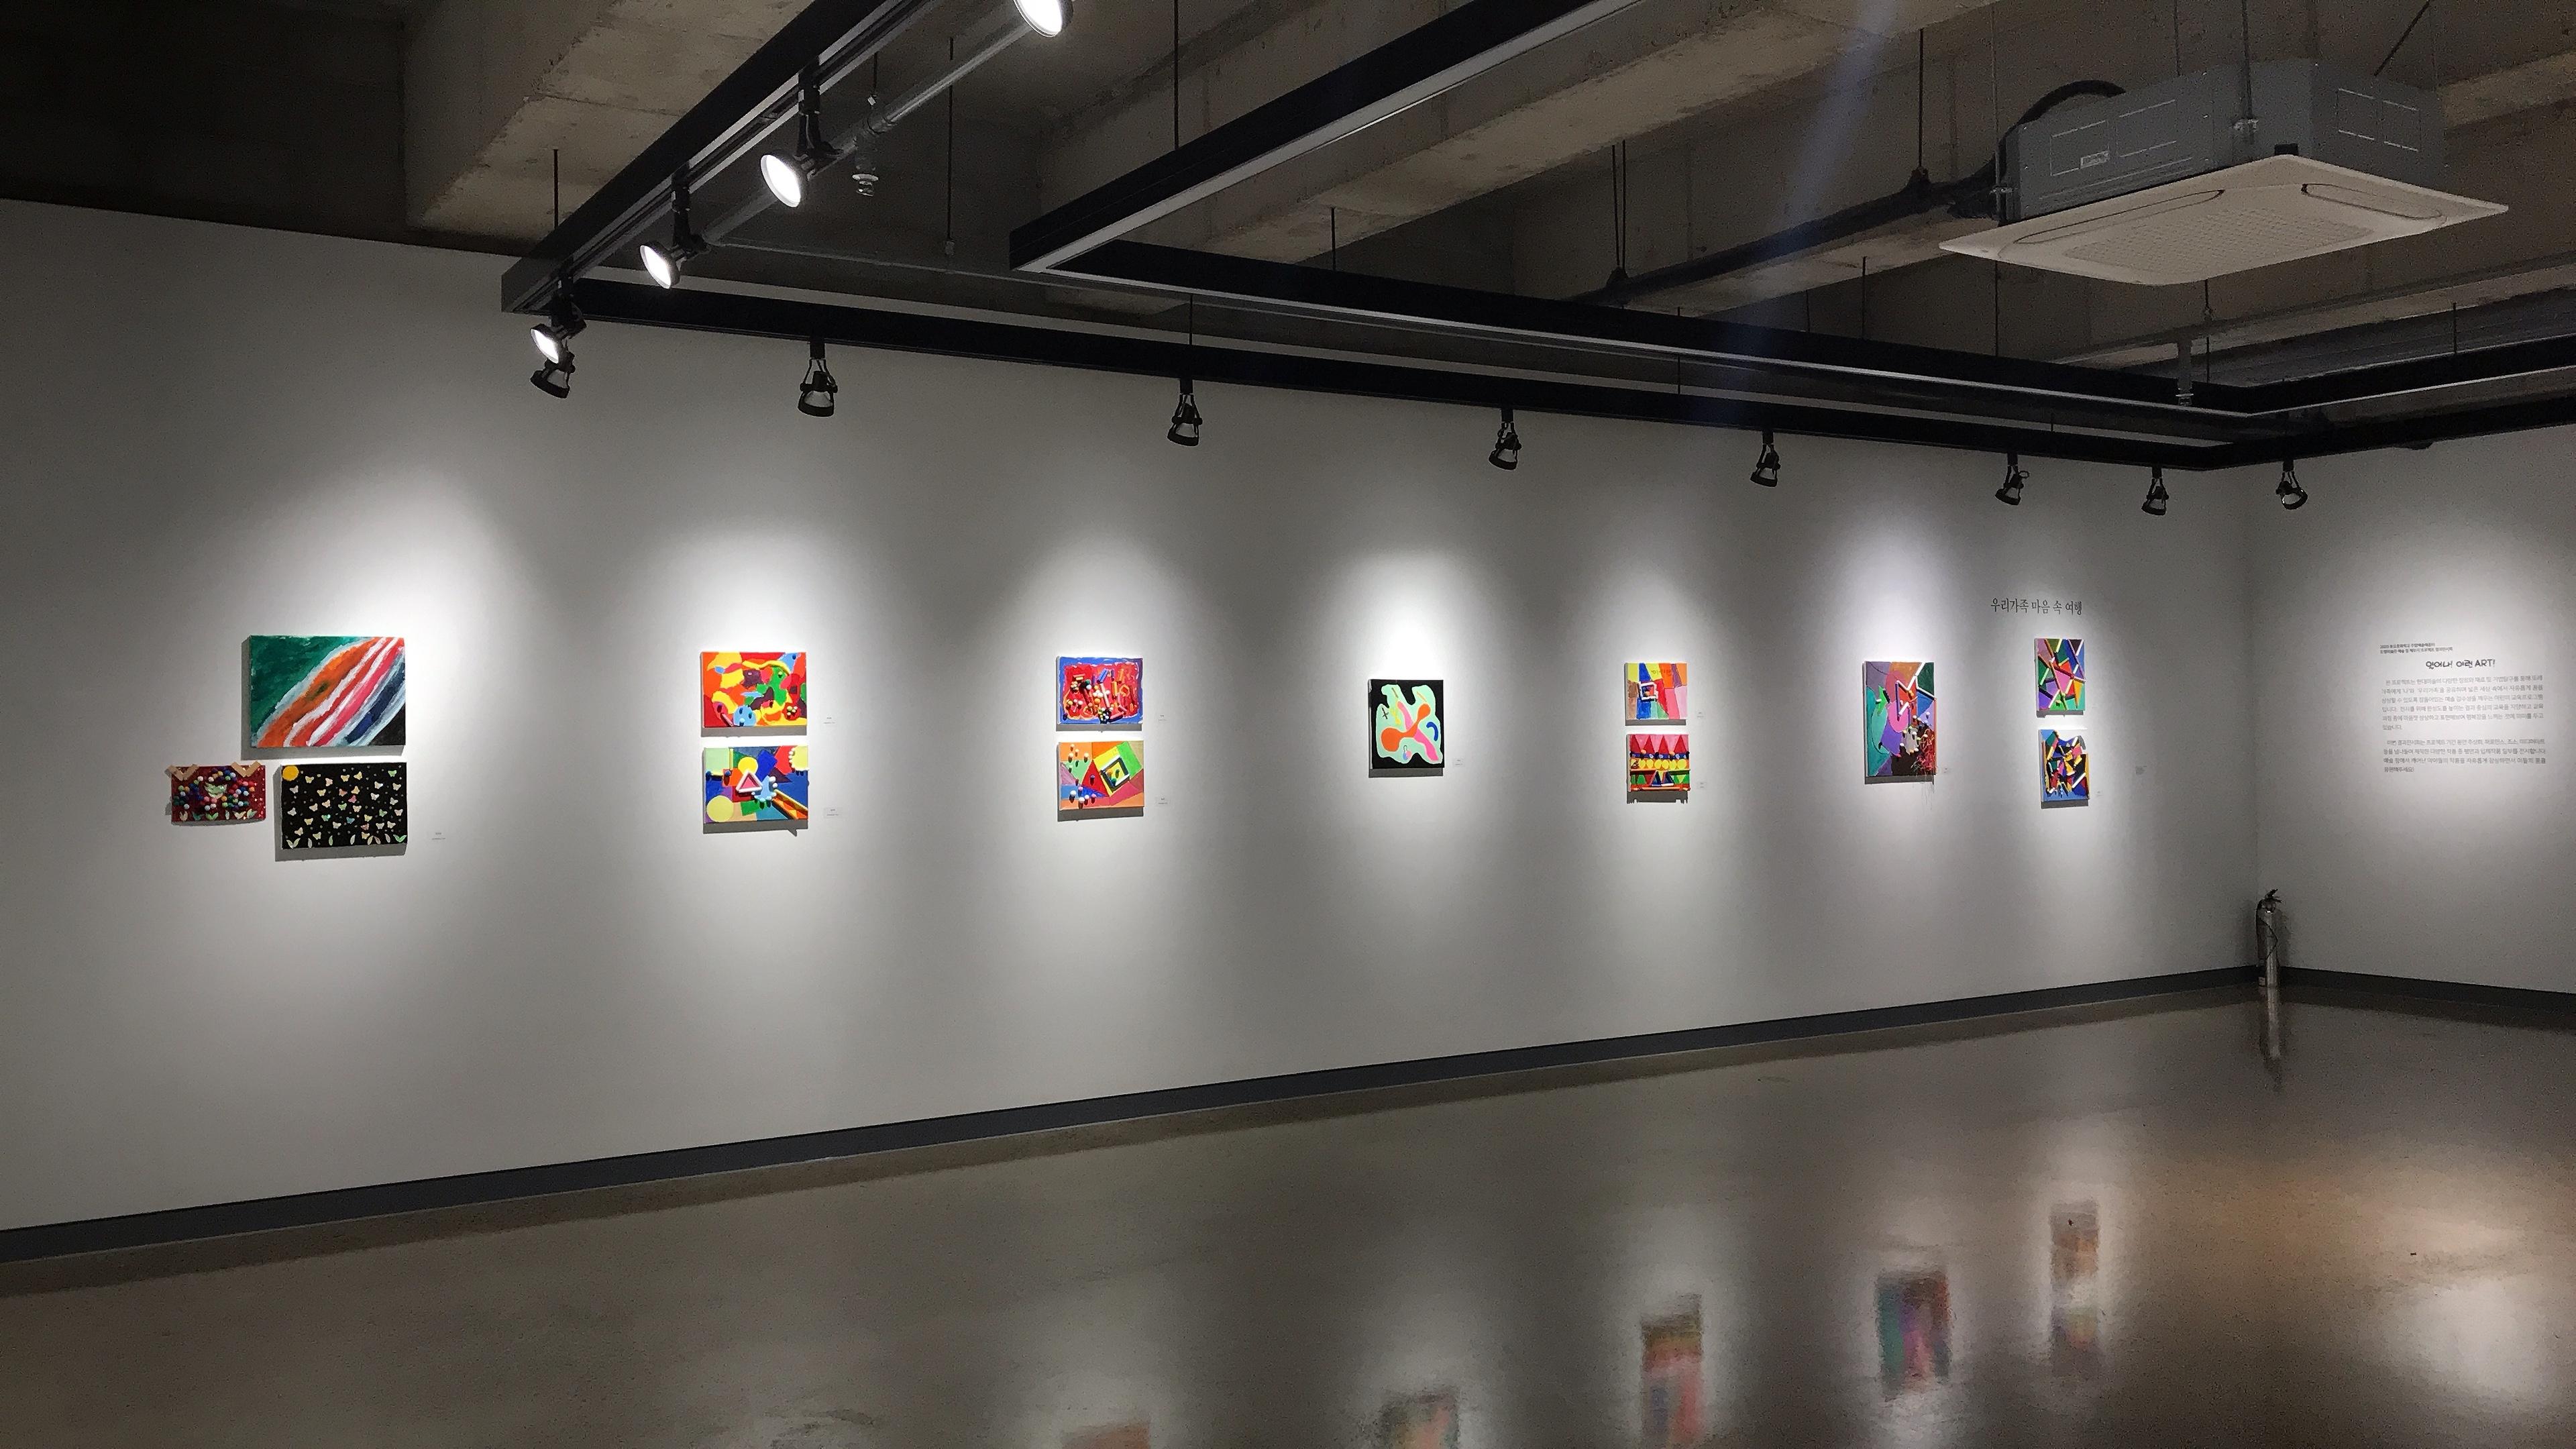 http://www.deyoungmuseum.co.kr/bs/se2/imgup/1606289561KakaoTalk_20201121_133211160_05.jpg